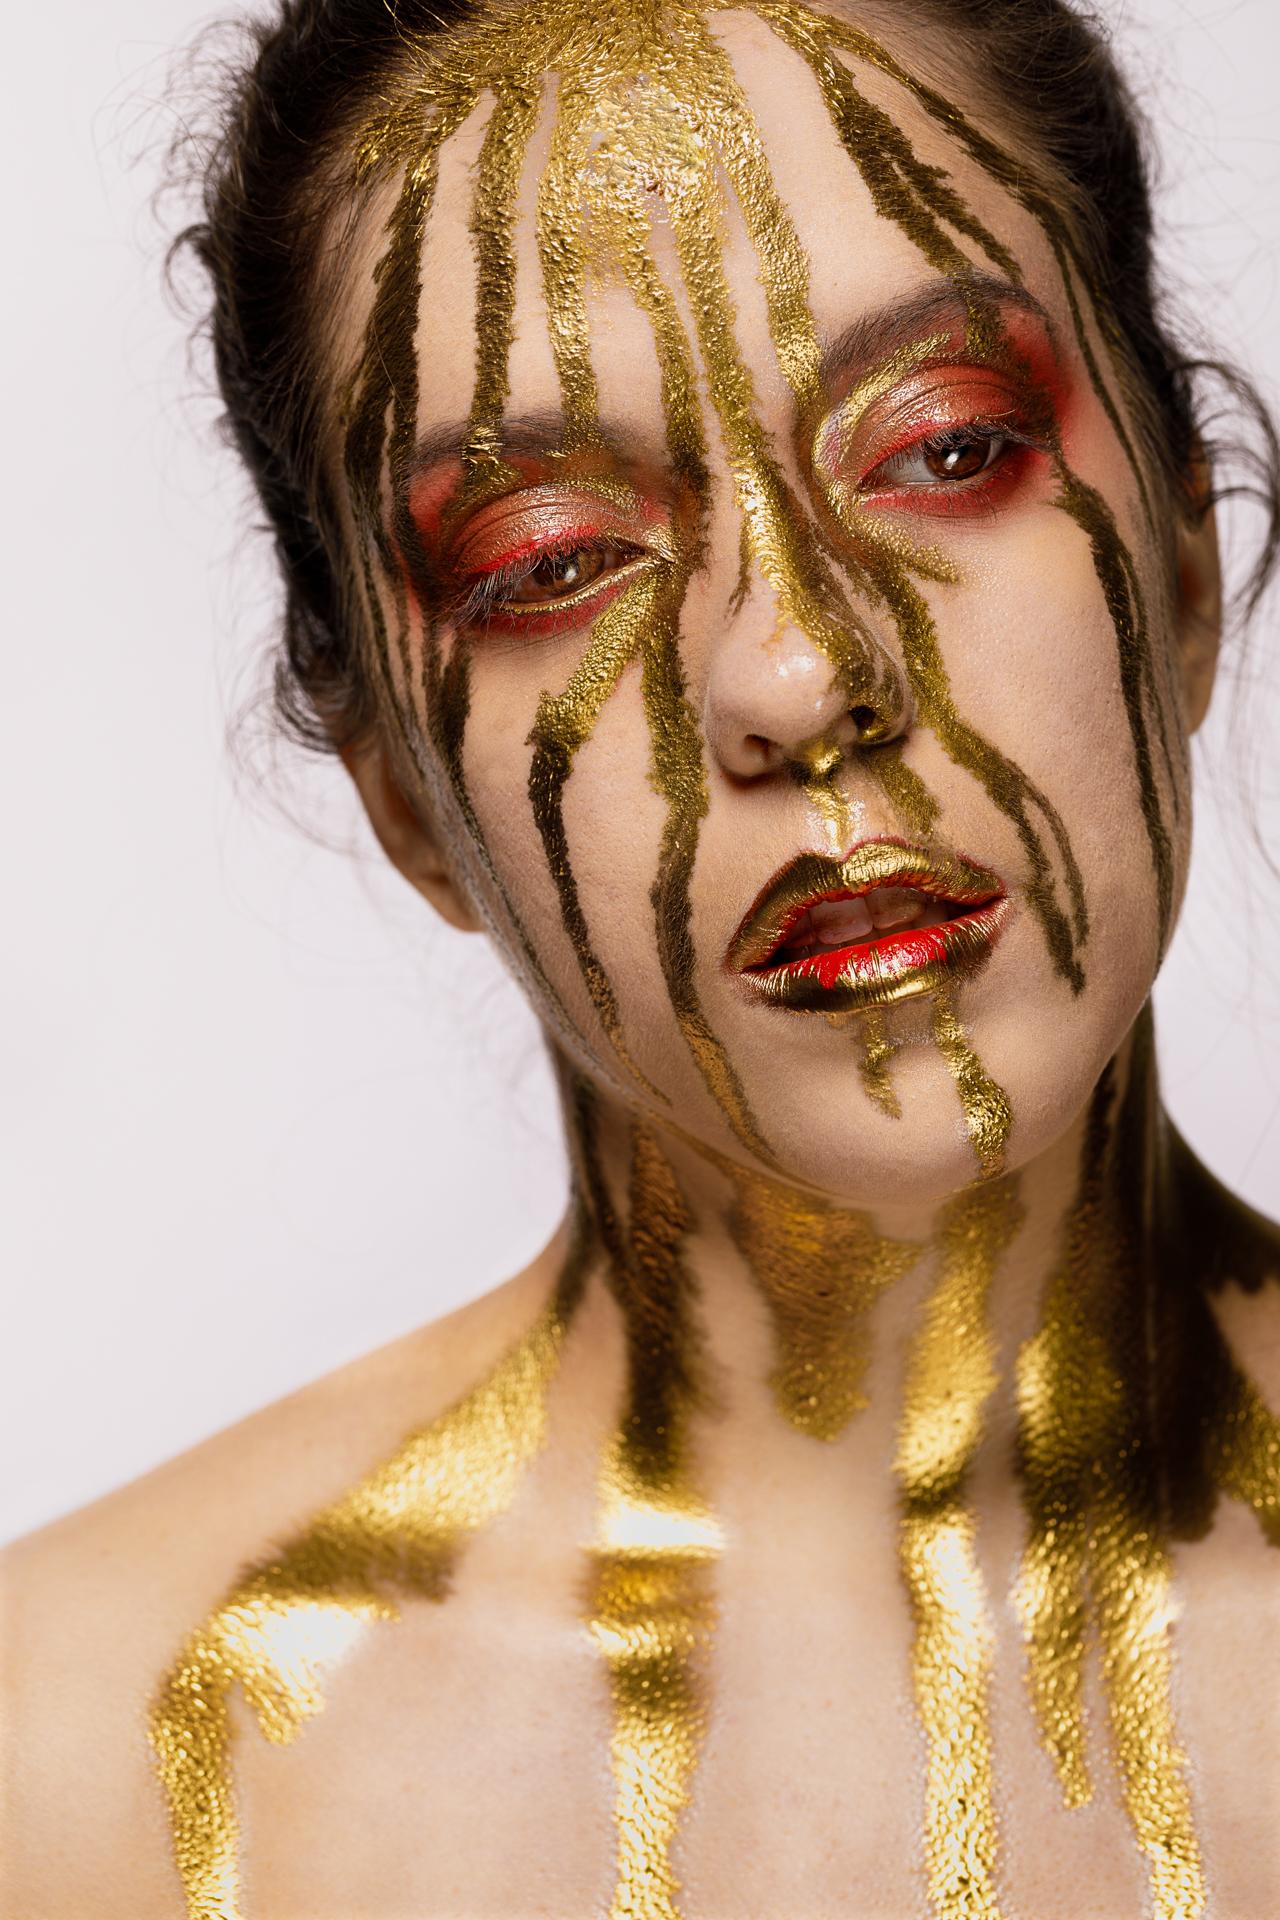 CFrenette-Julie-maquillage-4